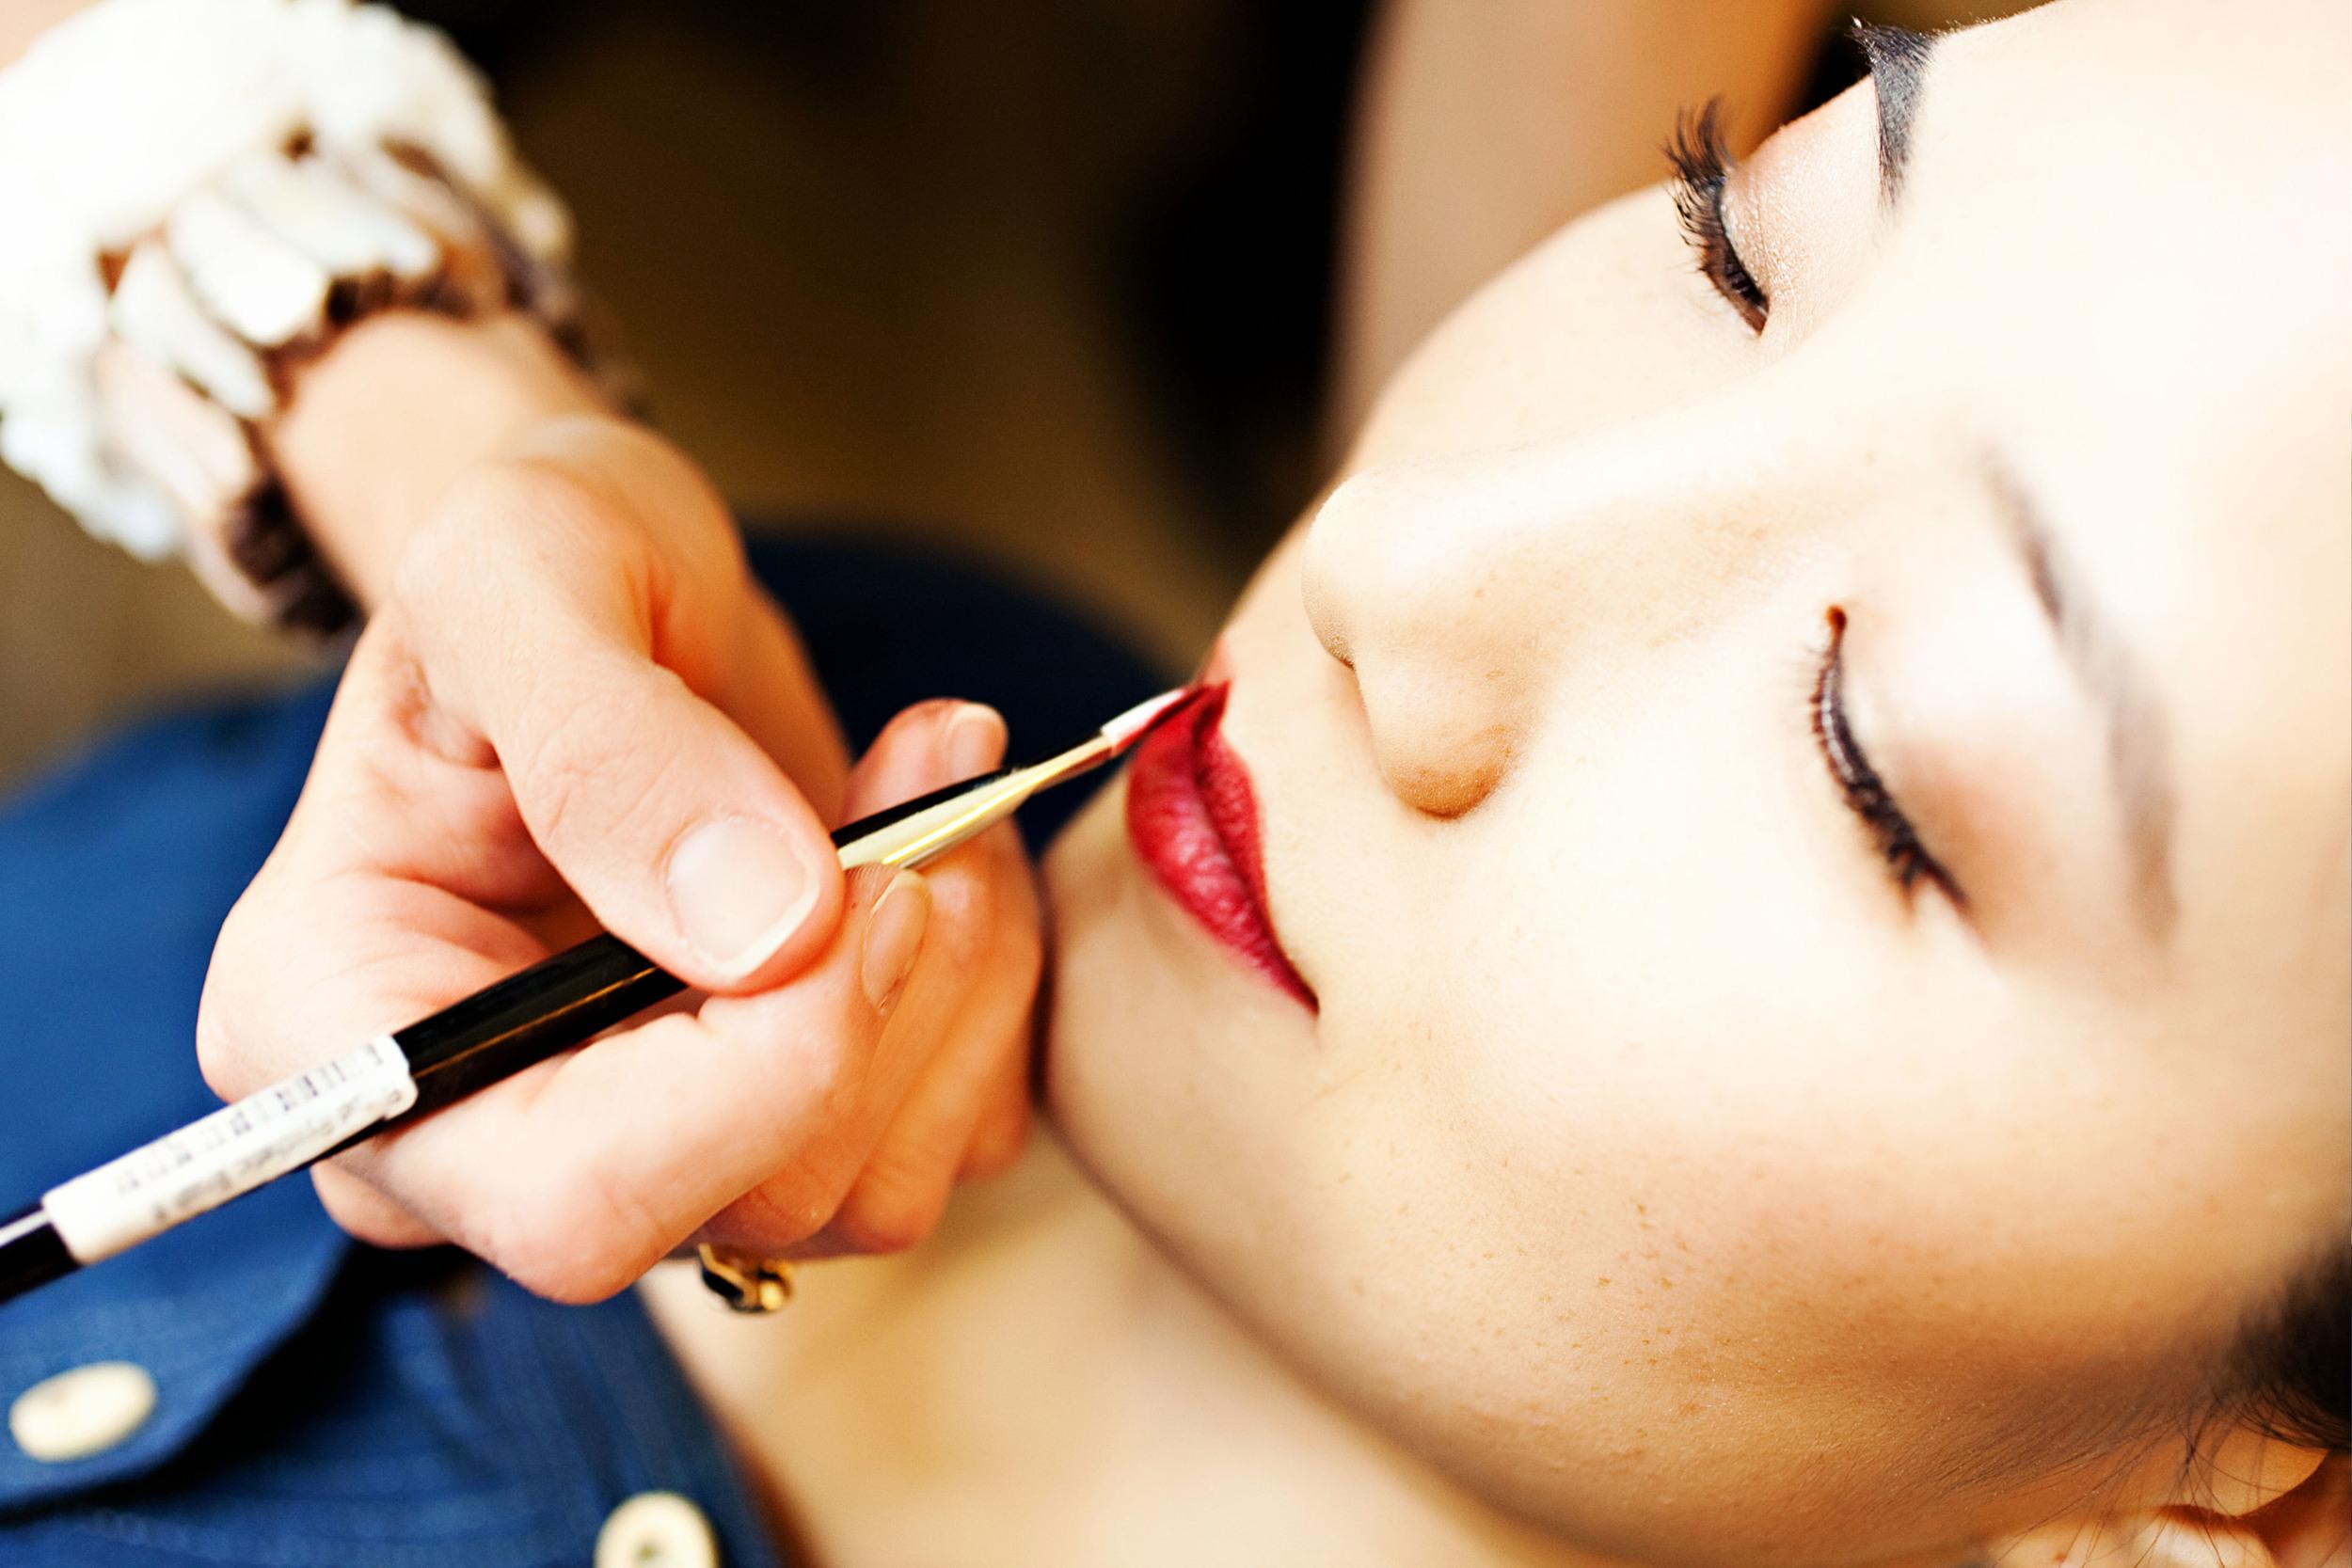 Makeup-Lessons-Professional-Makeup-Artist-San-Francisco.jpg